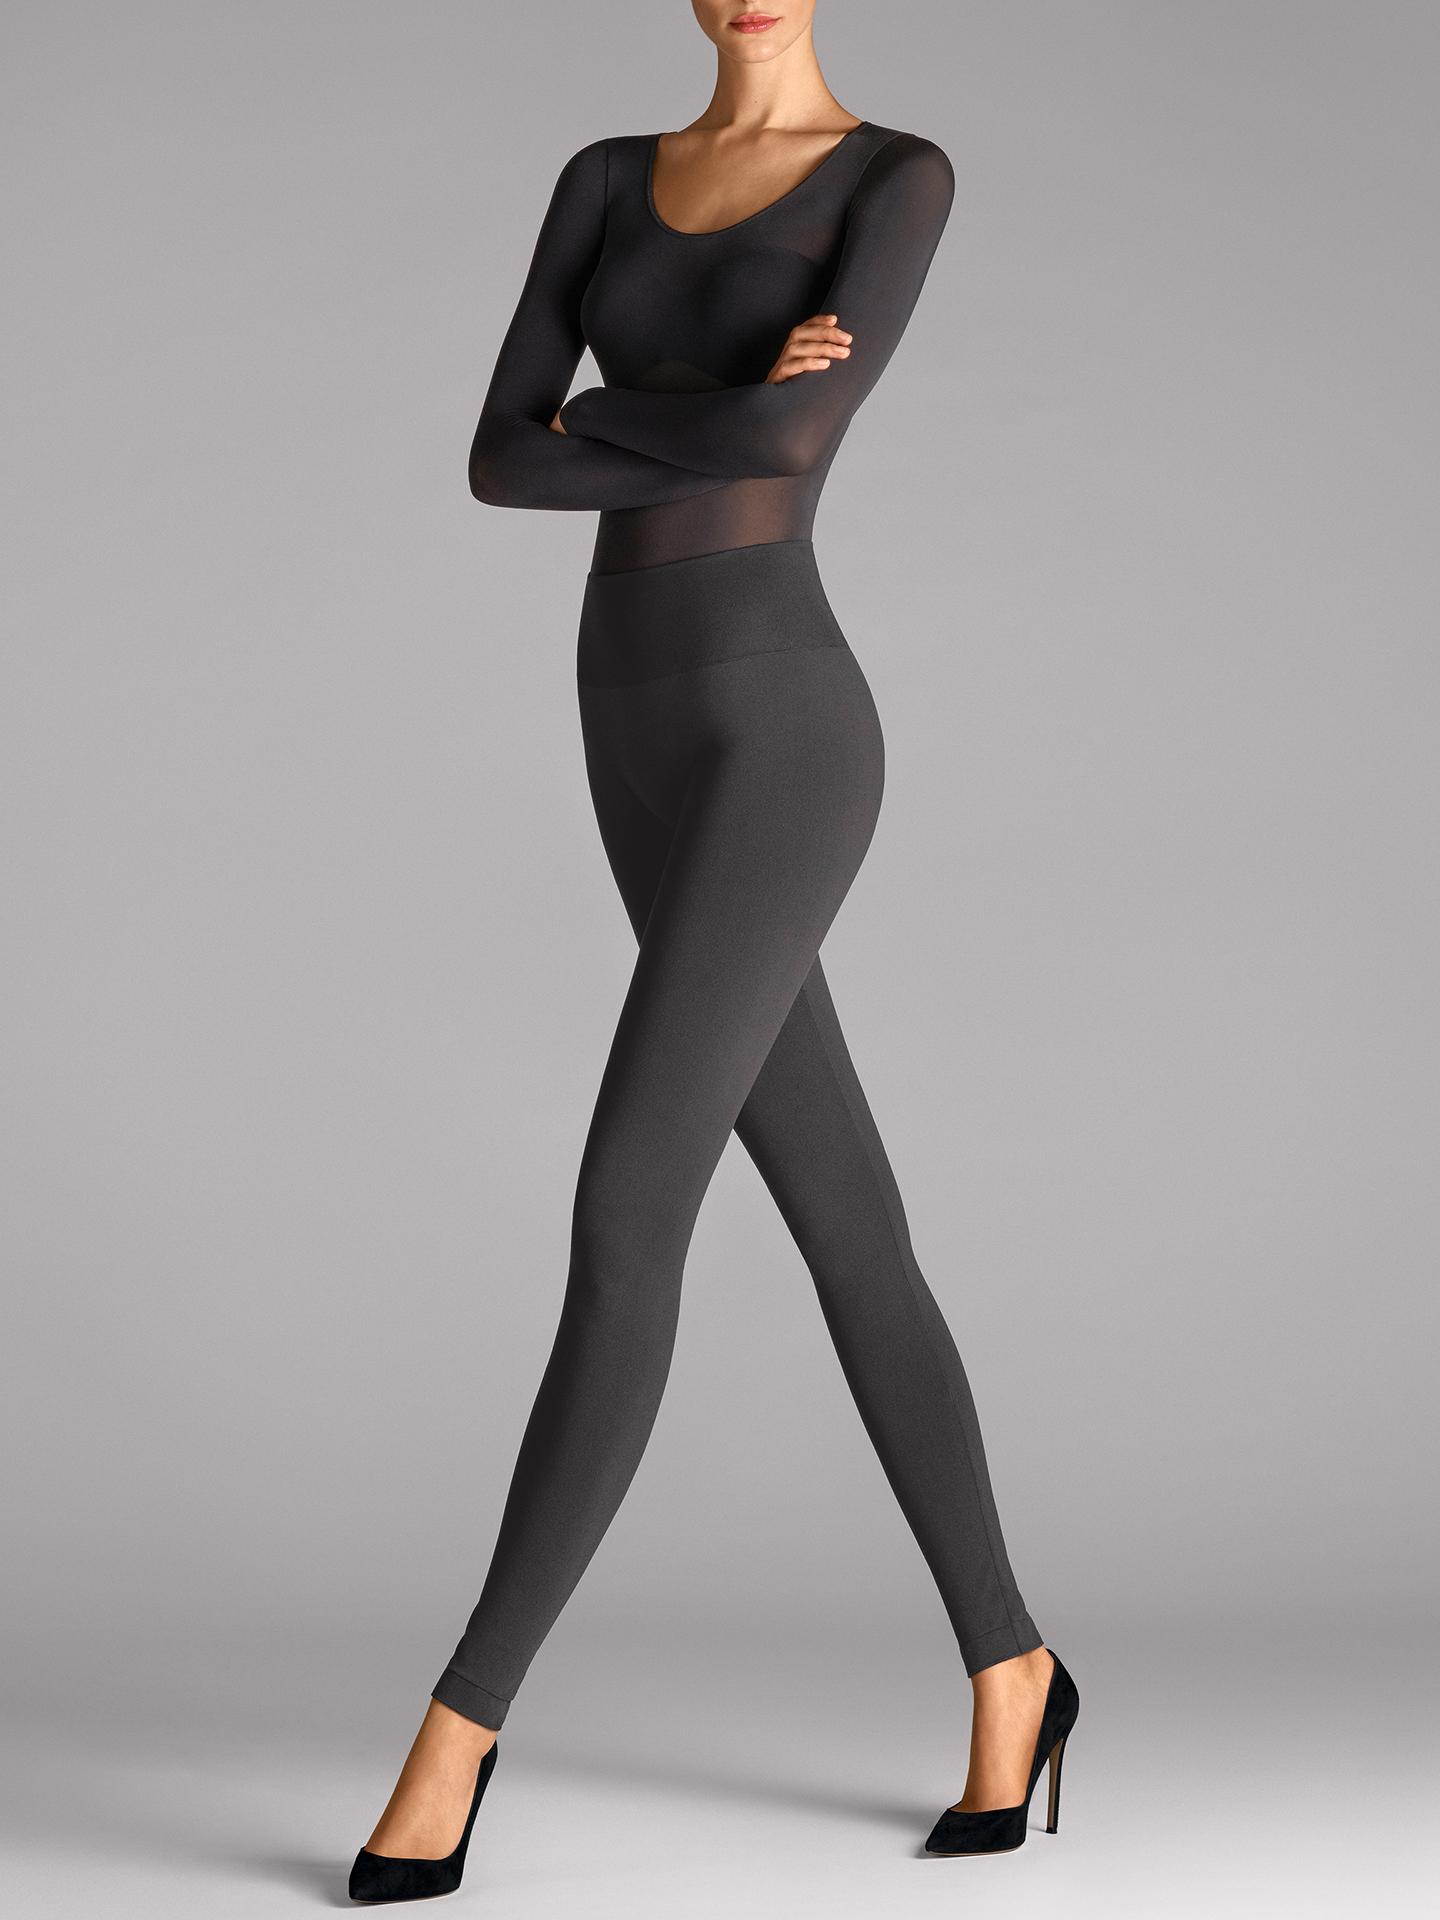 Perfect Fit Leggings - 7221 - L | Bekleidung > Hosen > Leggings | Anthracite | Wolford